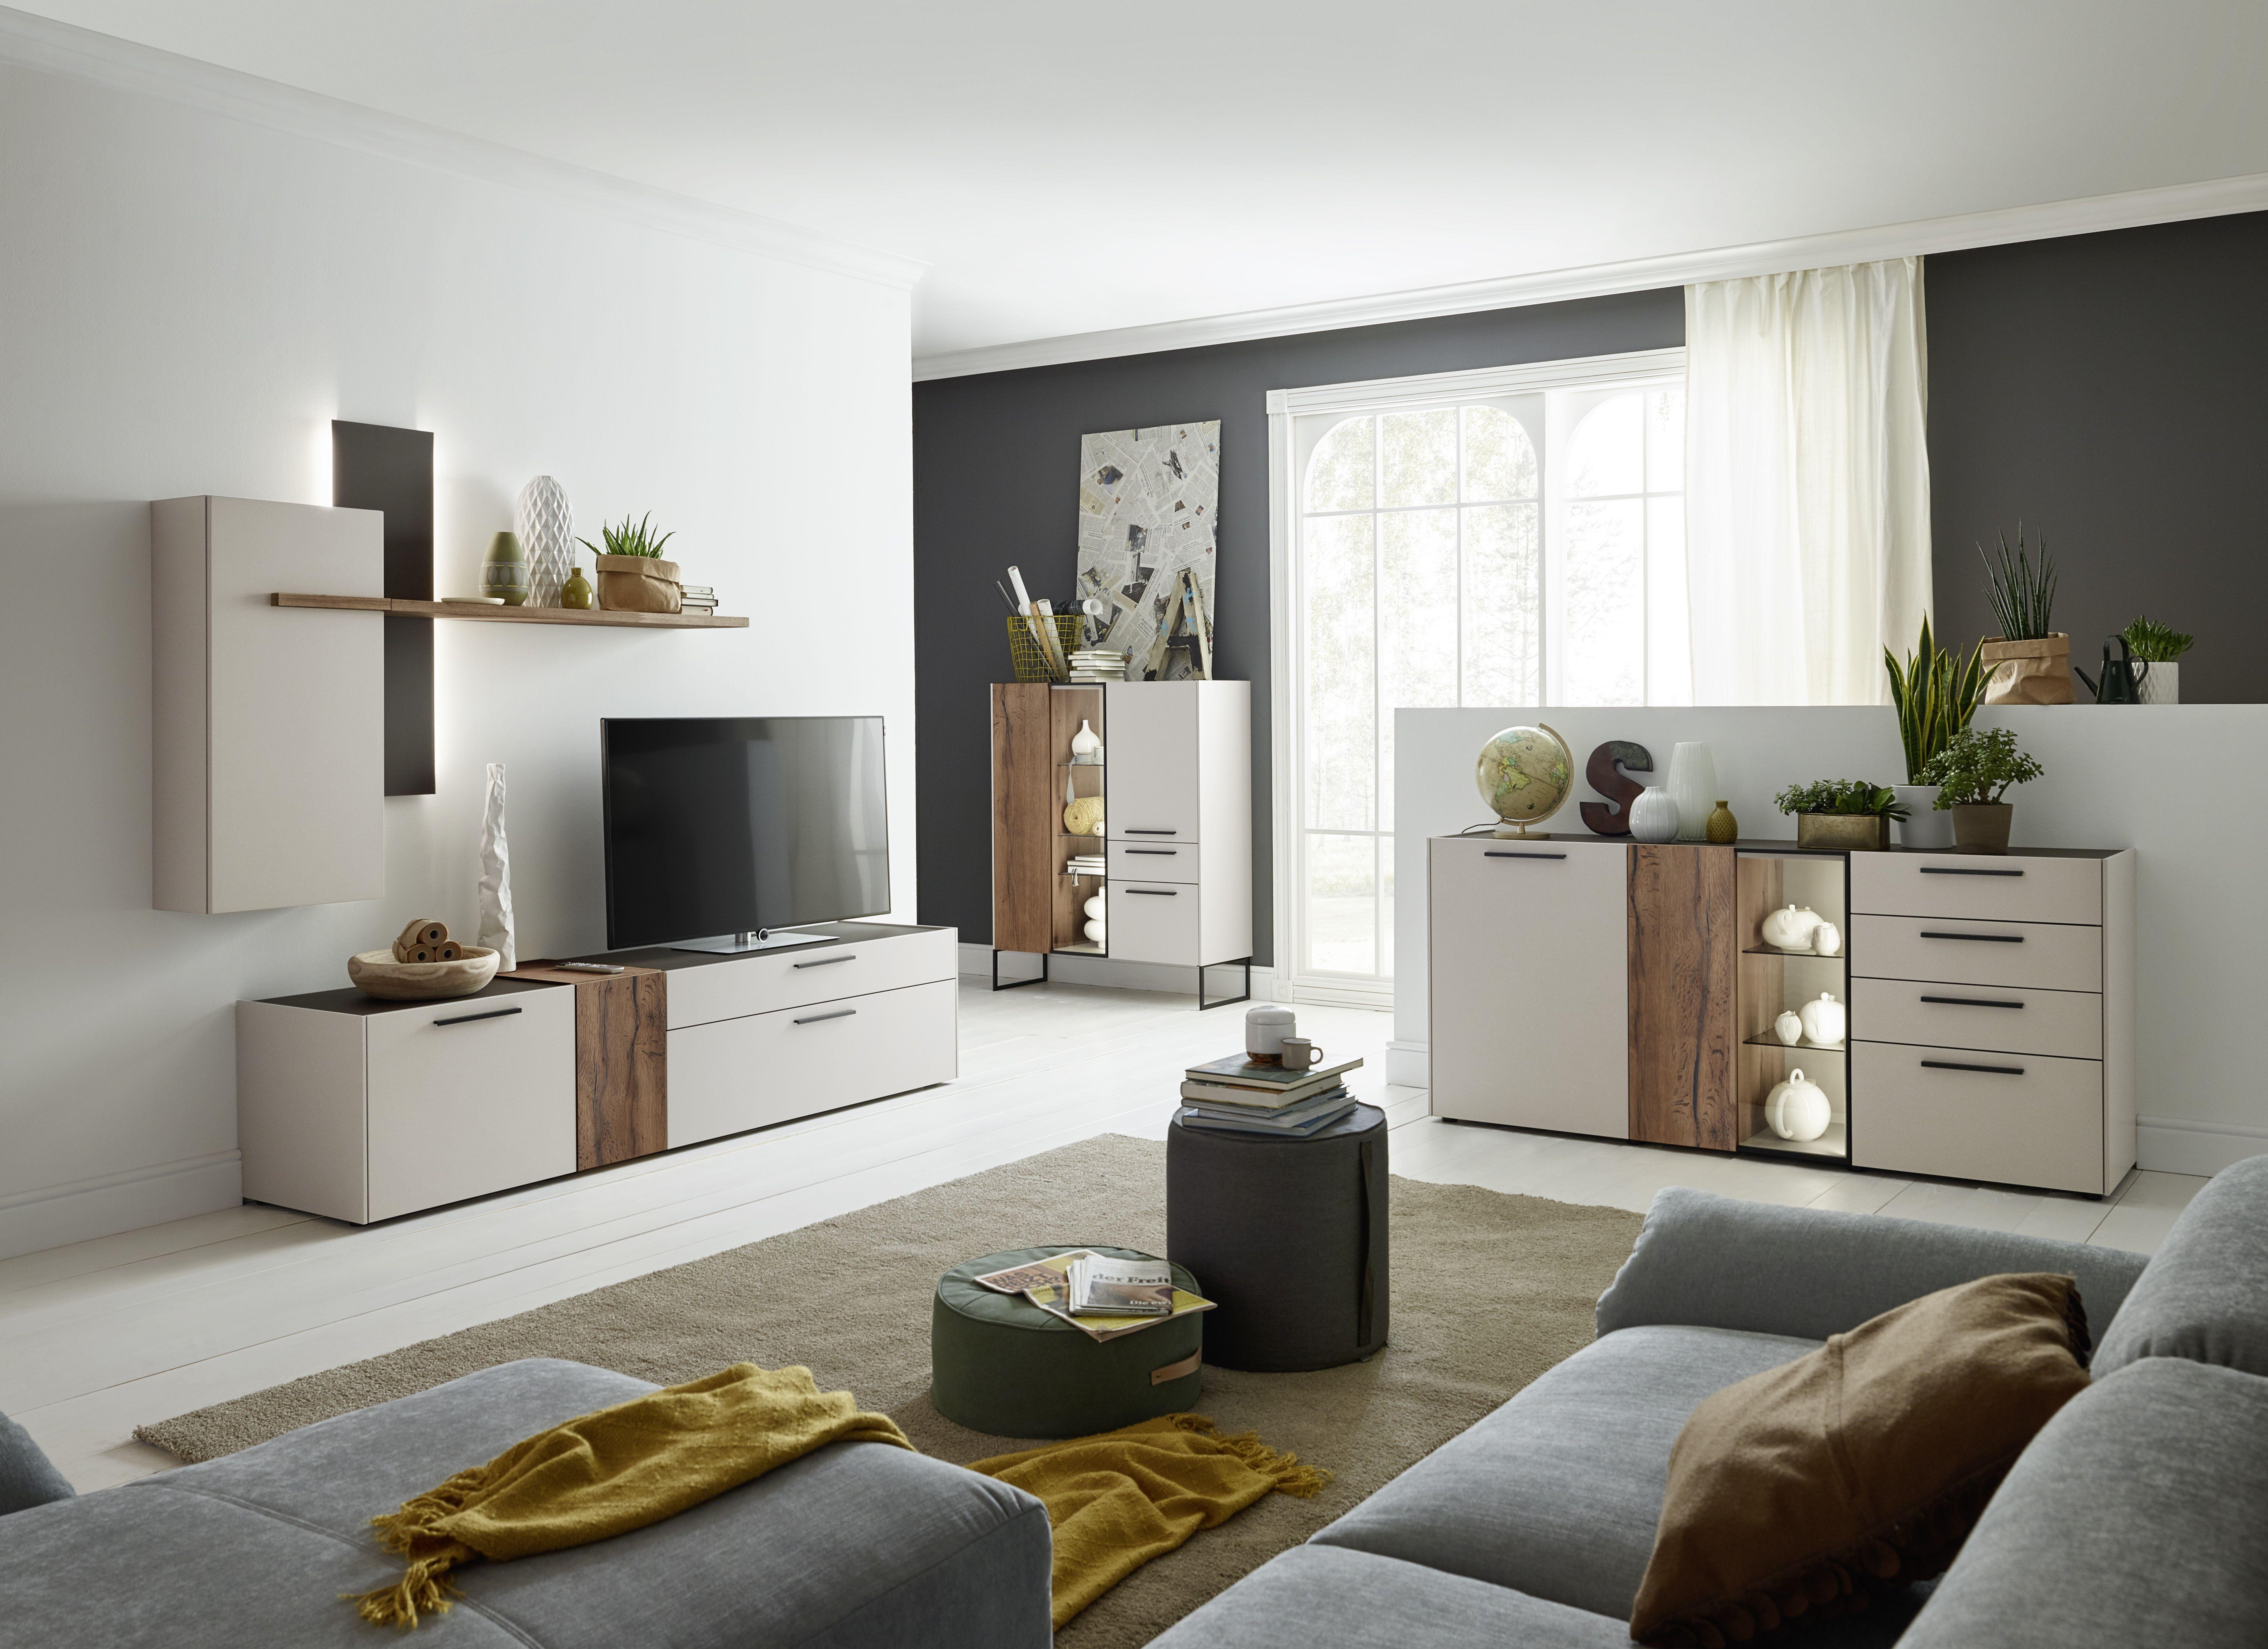 Charming #möbel #madeingermany #furniture #gwinner #wohndesign #design #wohnzimmer  #livingroom Awesome Design